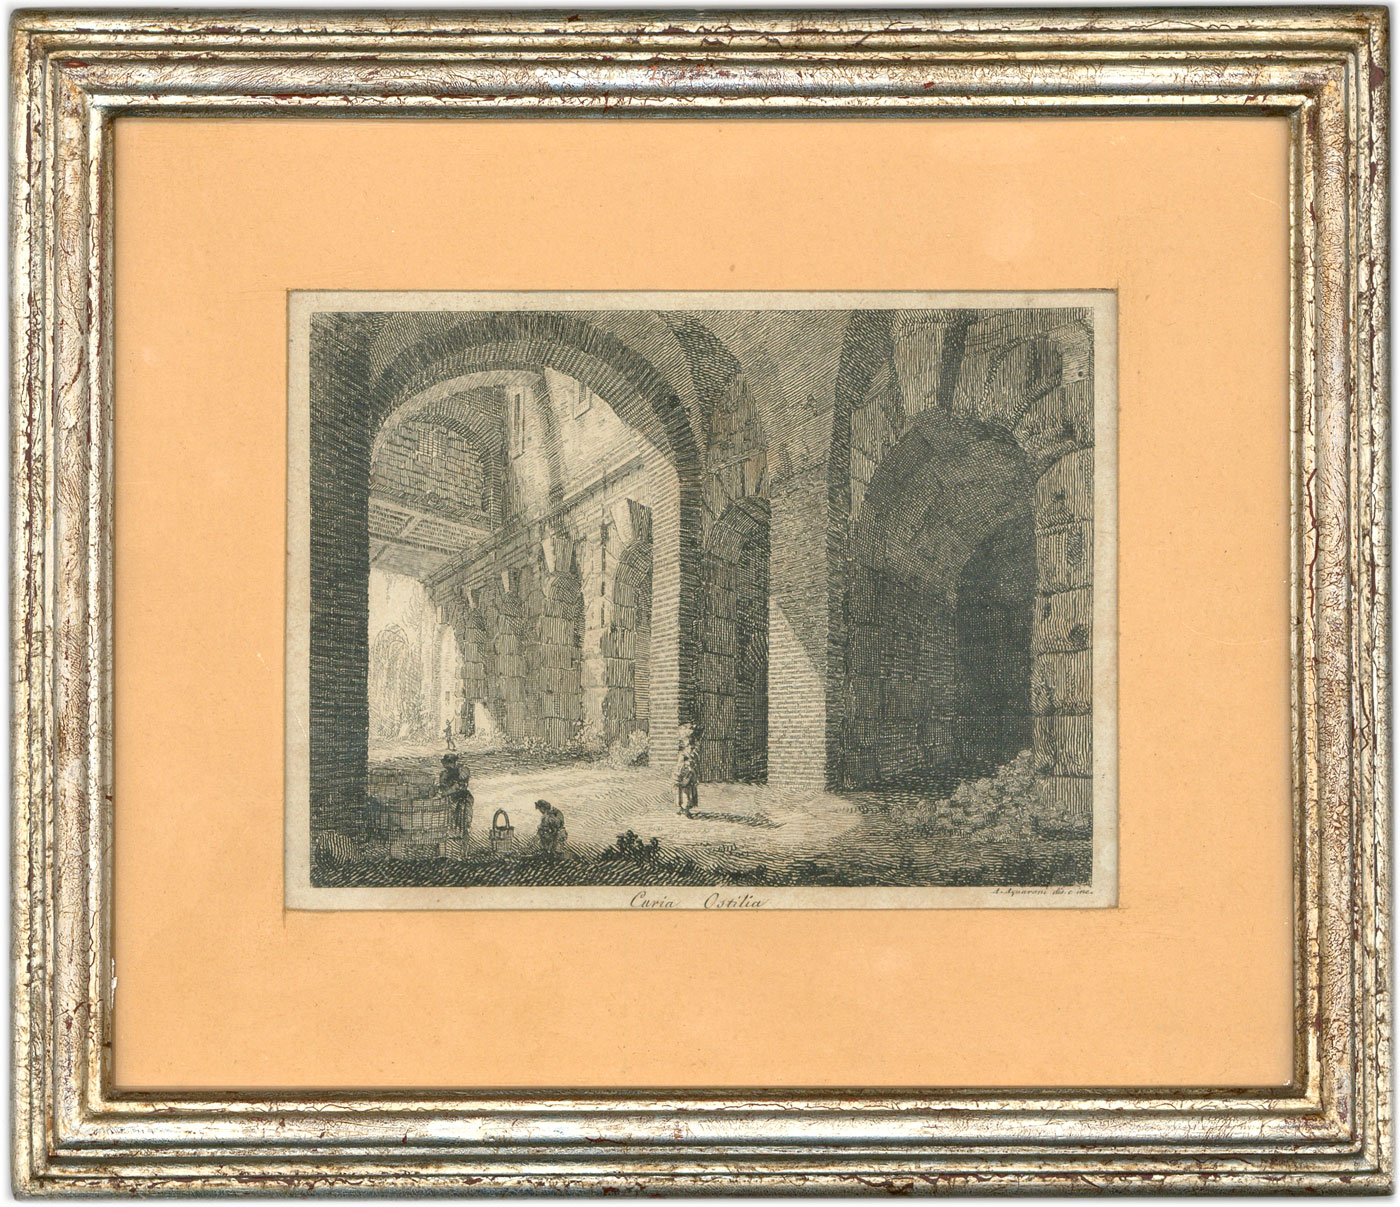 Antonio Acquaroni - Framed Early 19th Century Etching, Curio Ostilia